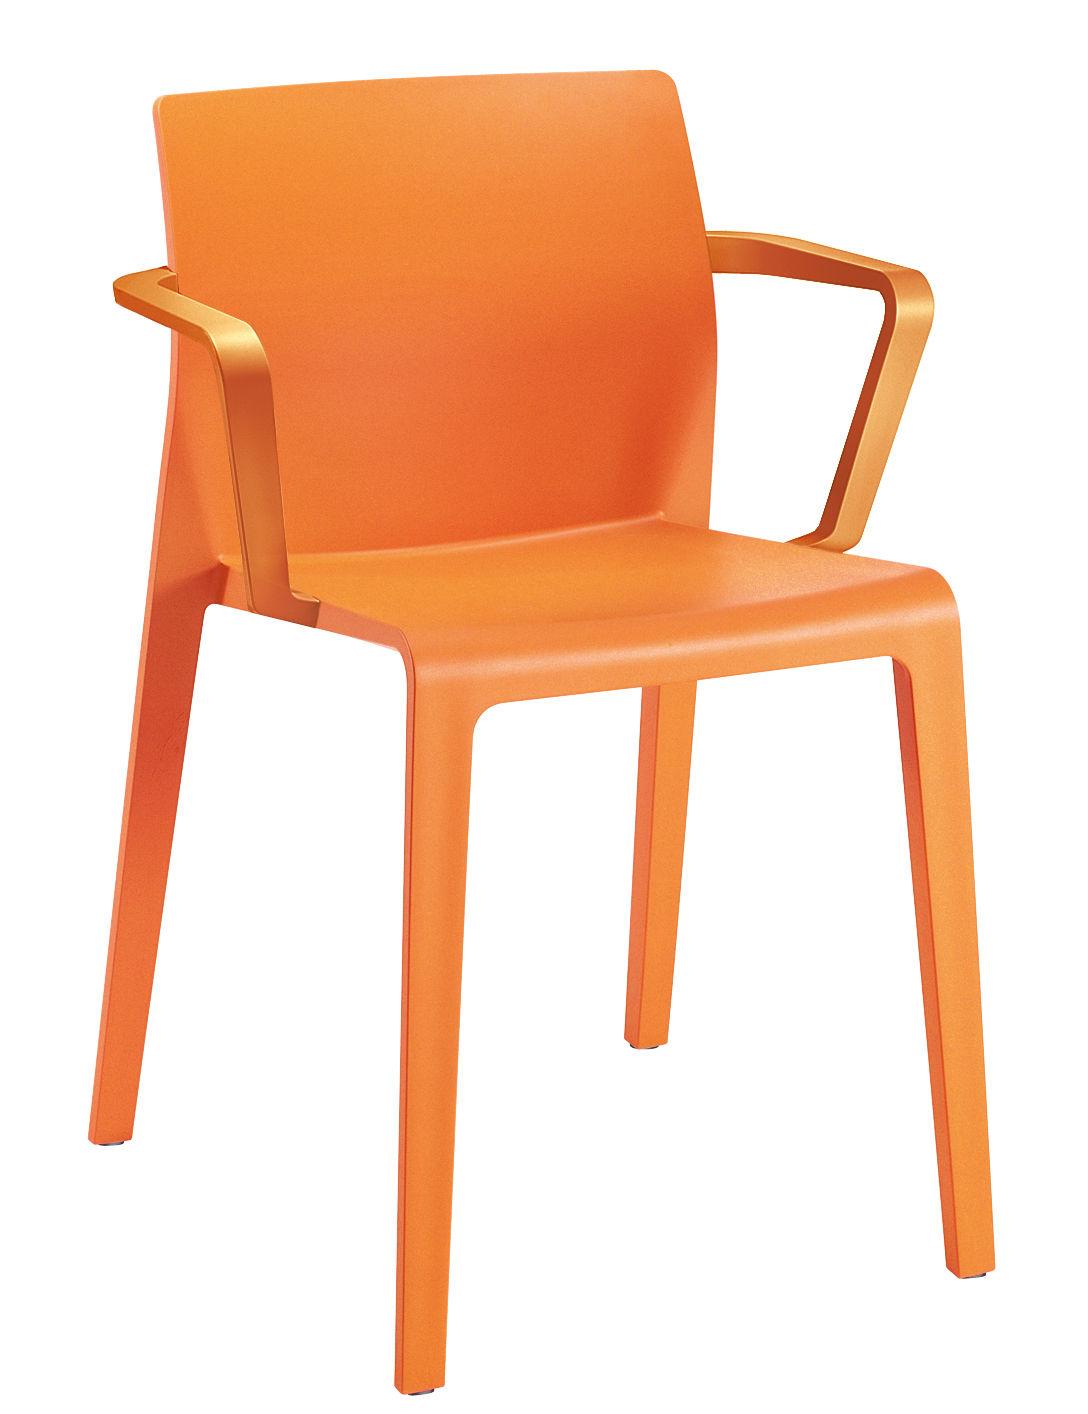 Furniture - Chairs - Juno Stackable armchair by Arper - Orange - Polypropylene